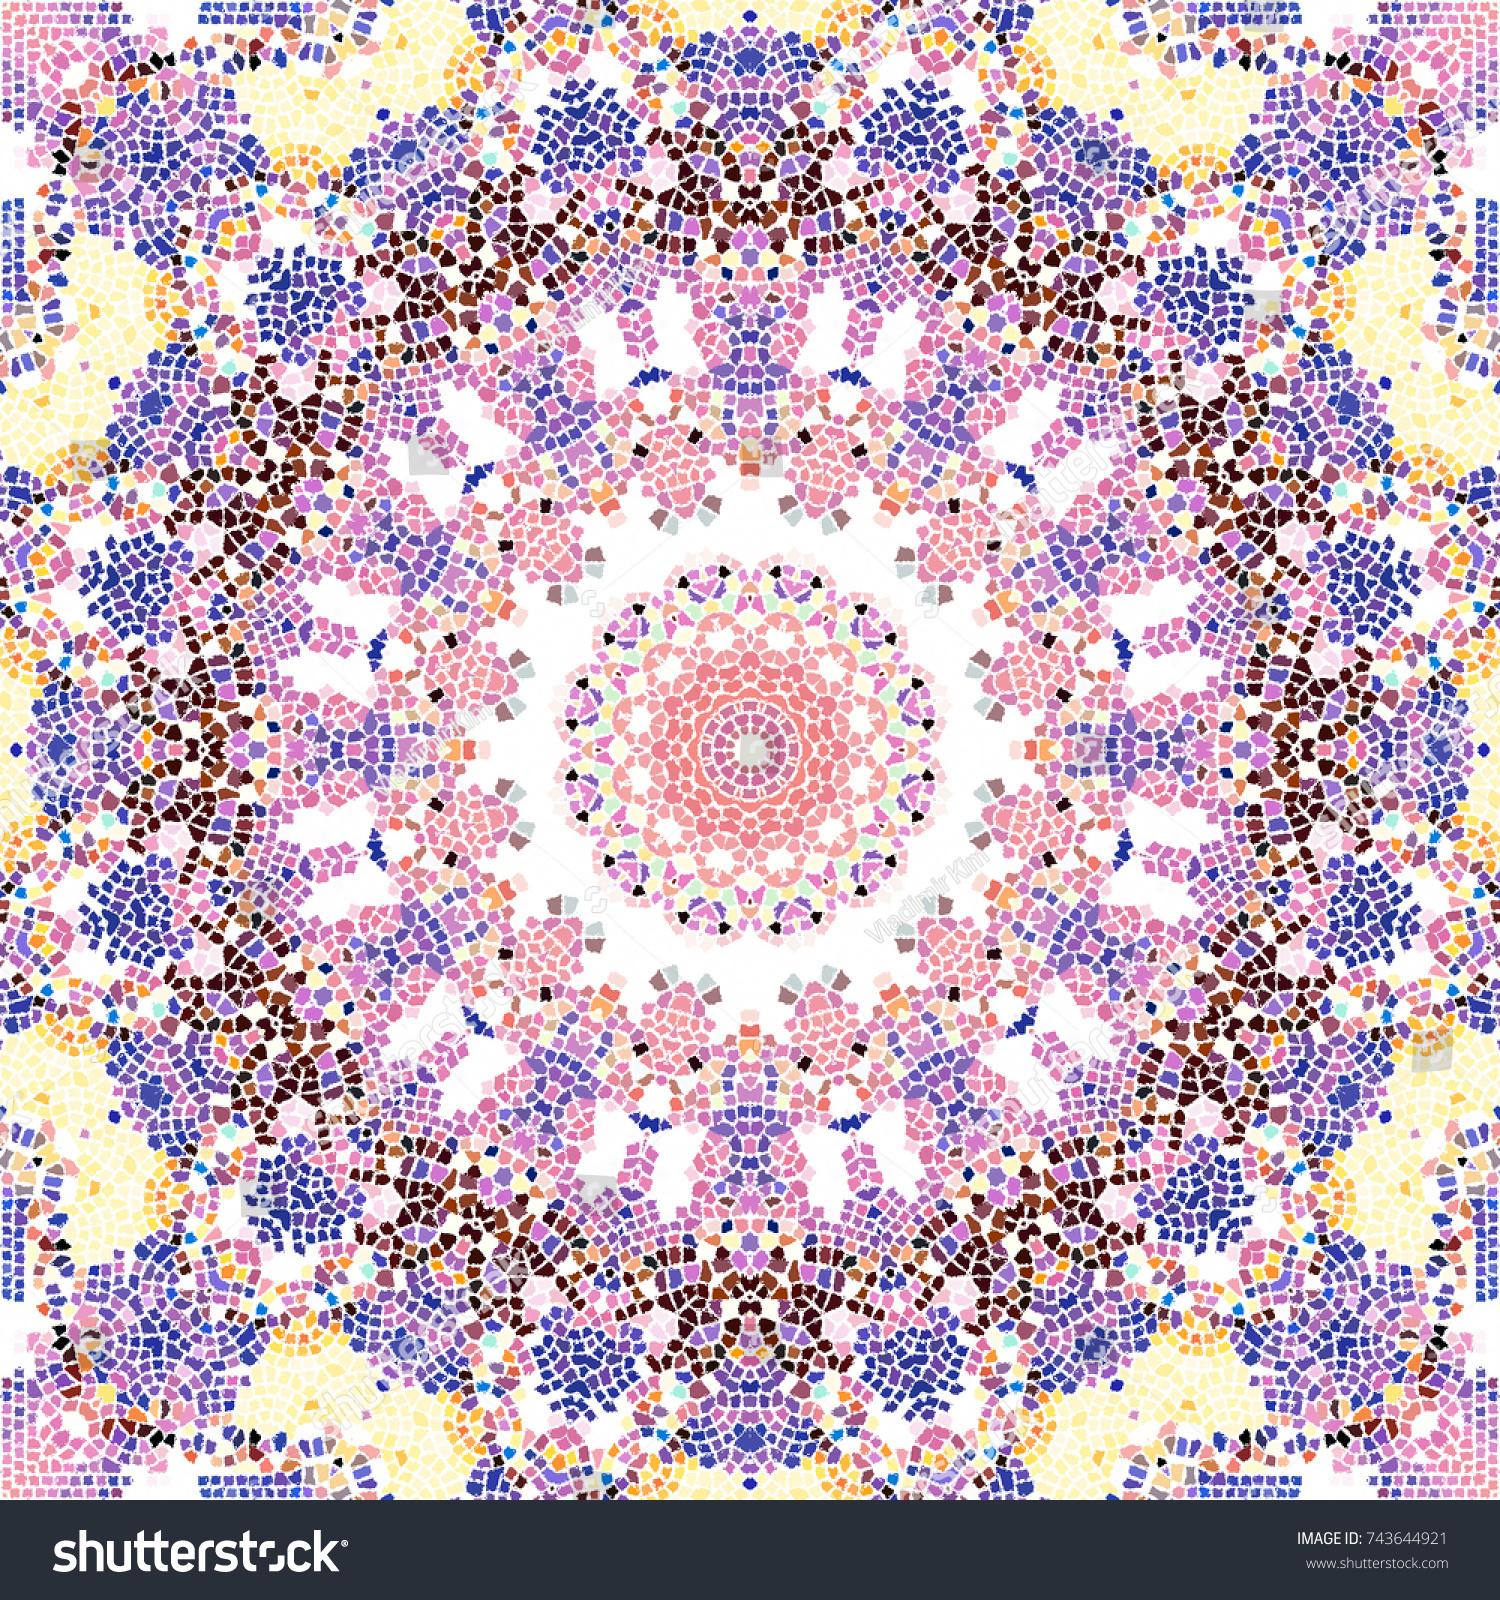 Colorful Mosaic Pattern For Textile Ceramic Tiles And Design Ez